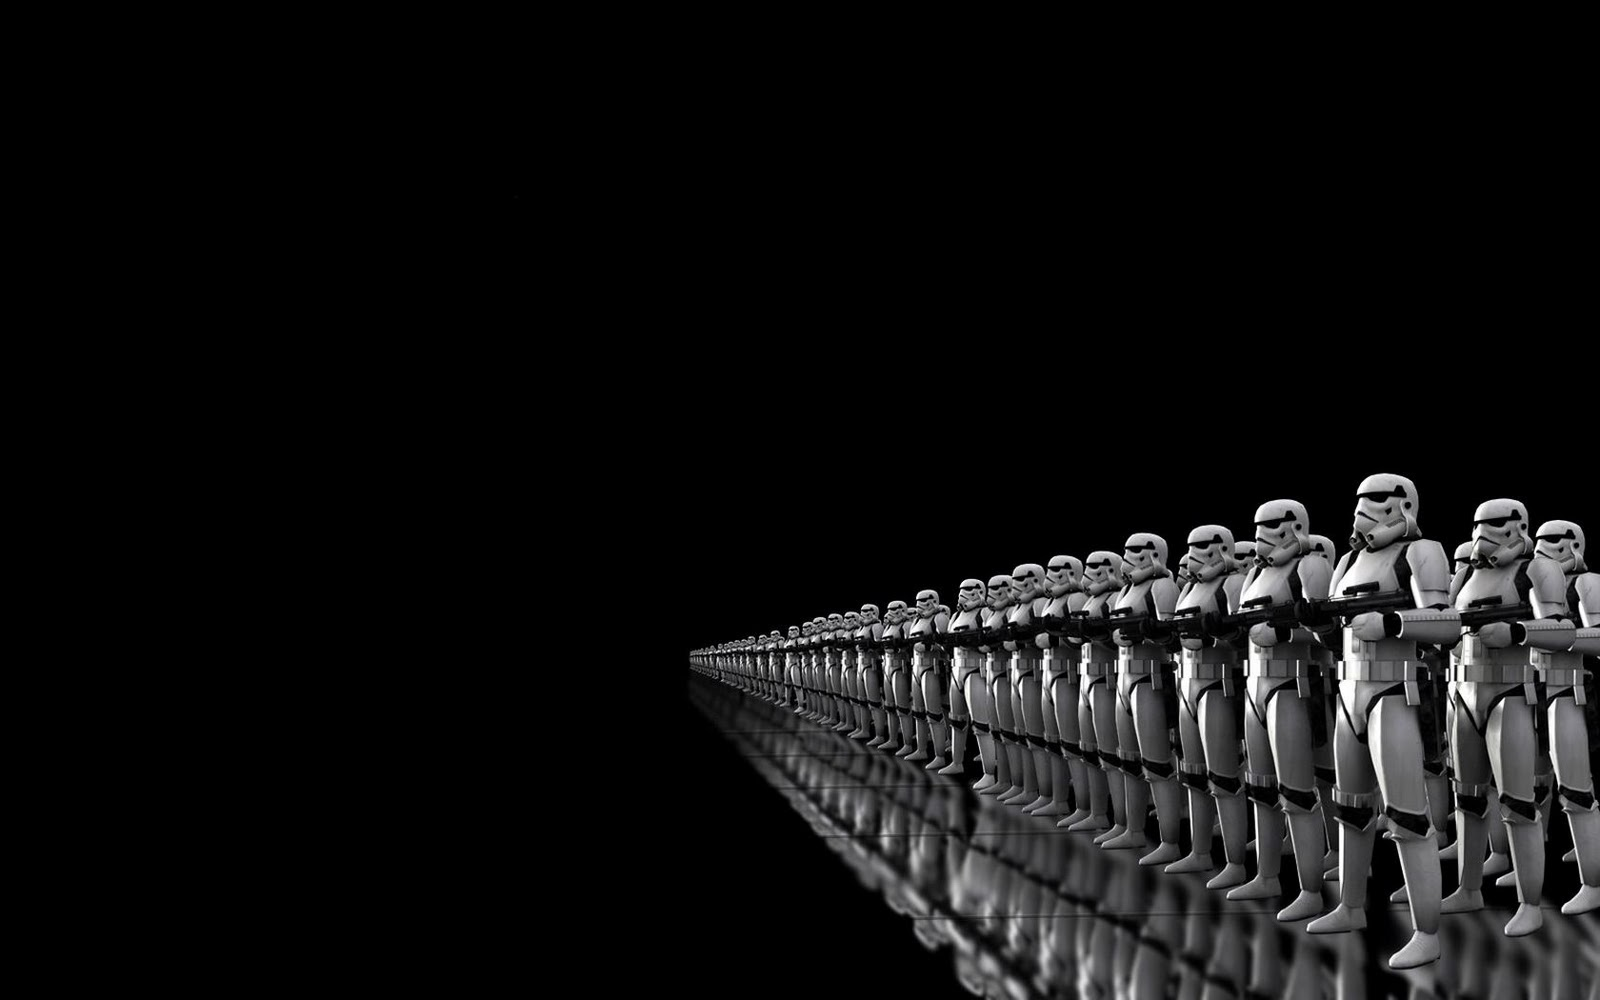 Cool Star Wars Backgrounds | Star Wars | Pinterest | Wallpaper